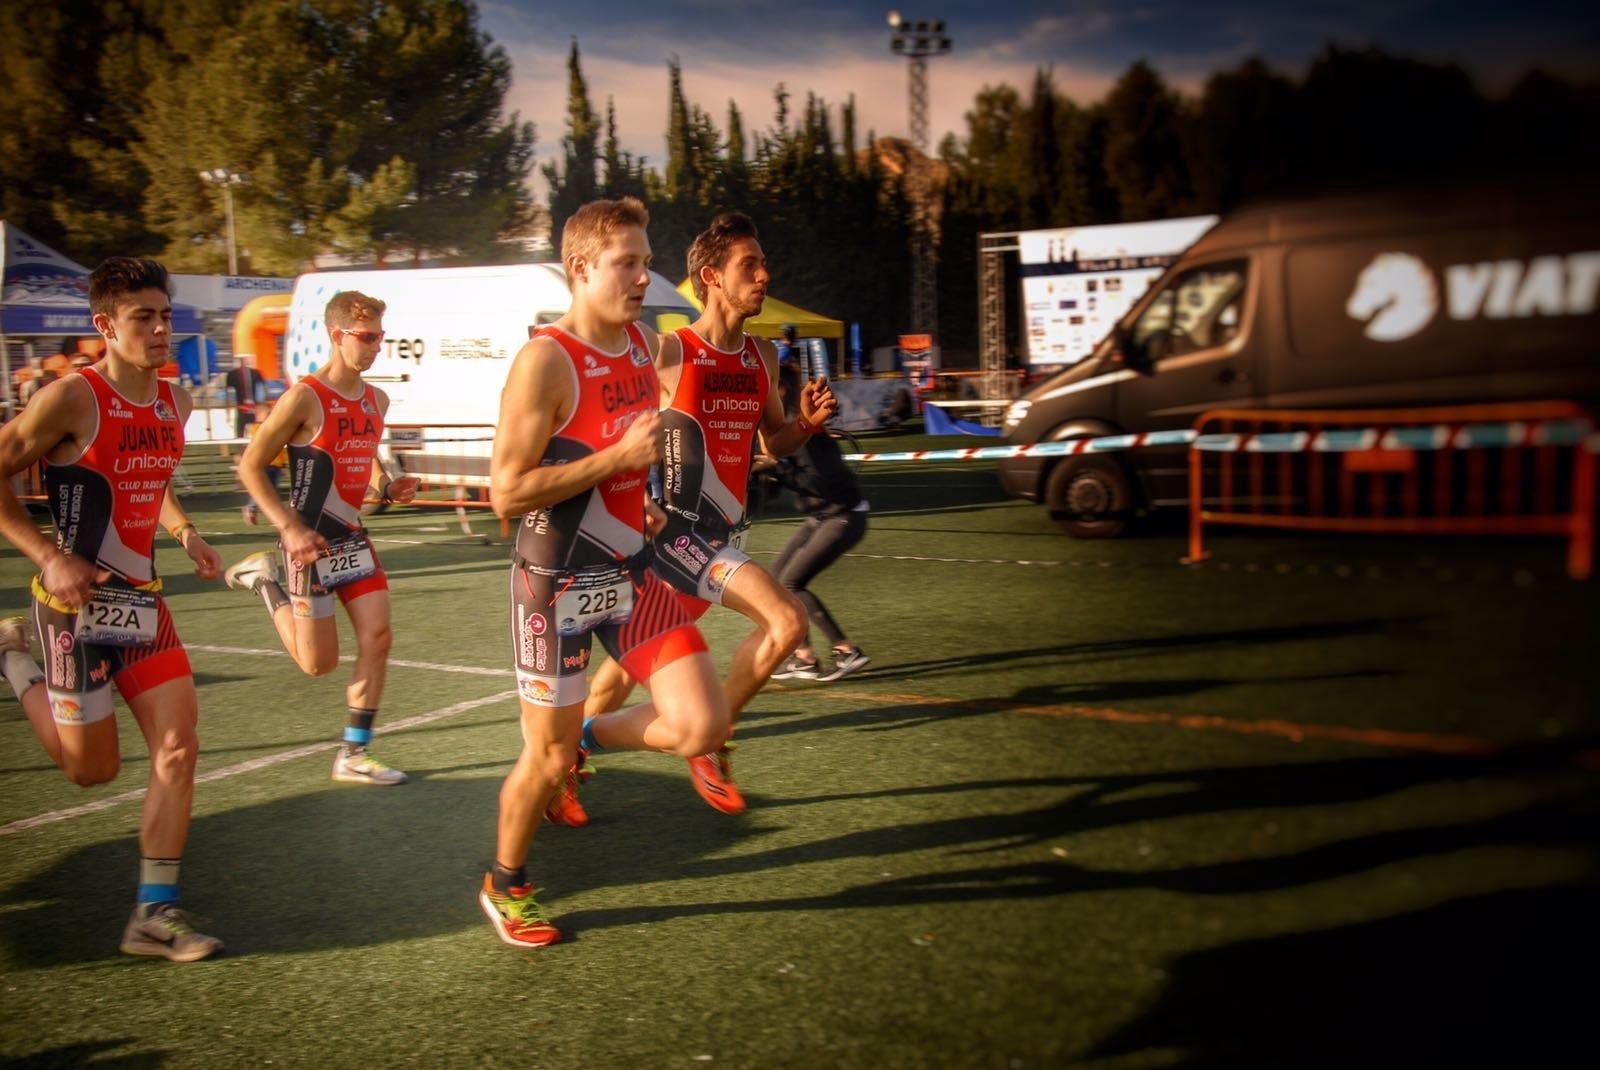 Club_Triatlon_Murcia_Unidata__Campeon_Regional_Duatln_por_Equipos_2018__Triatlon_Murcia_Archena_Femenino_5